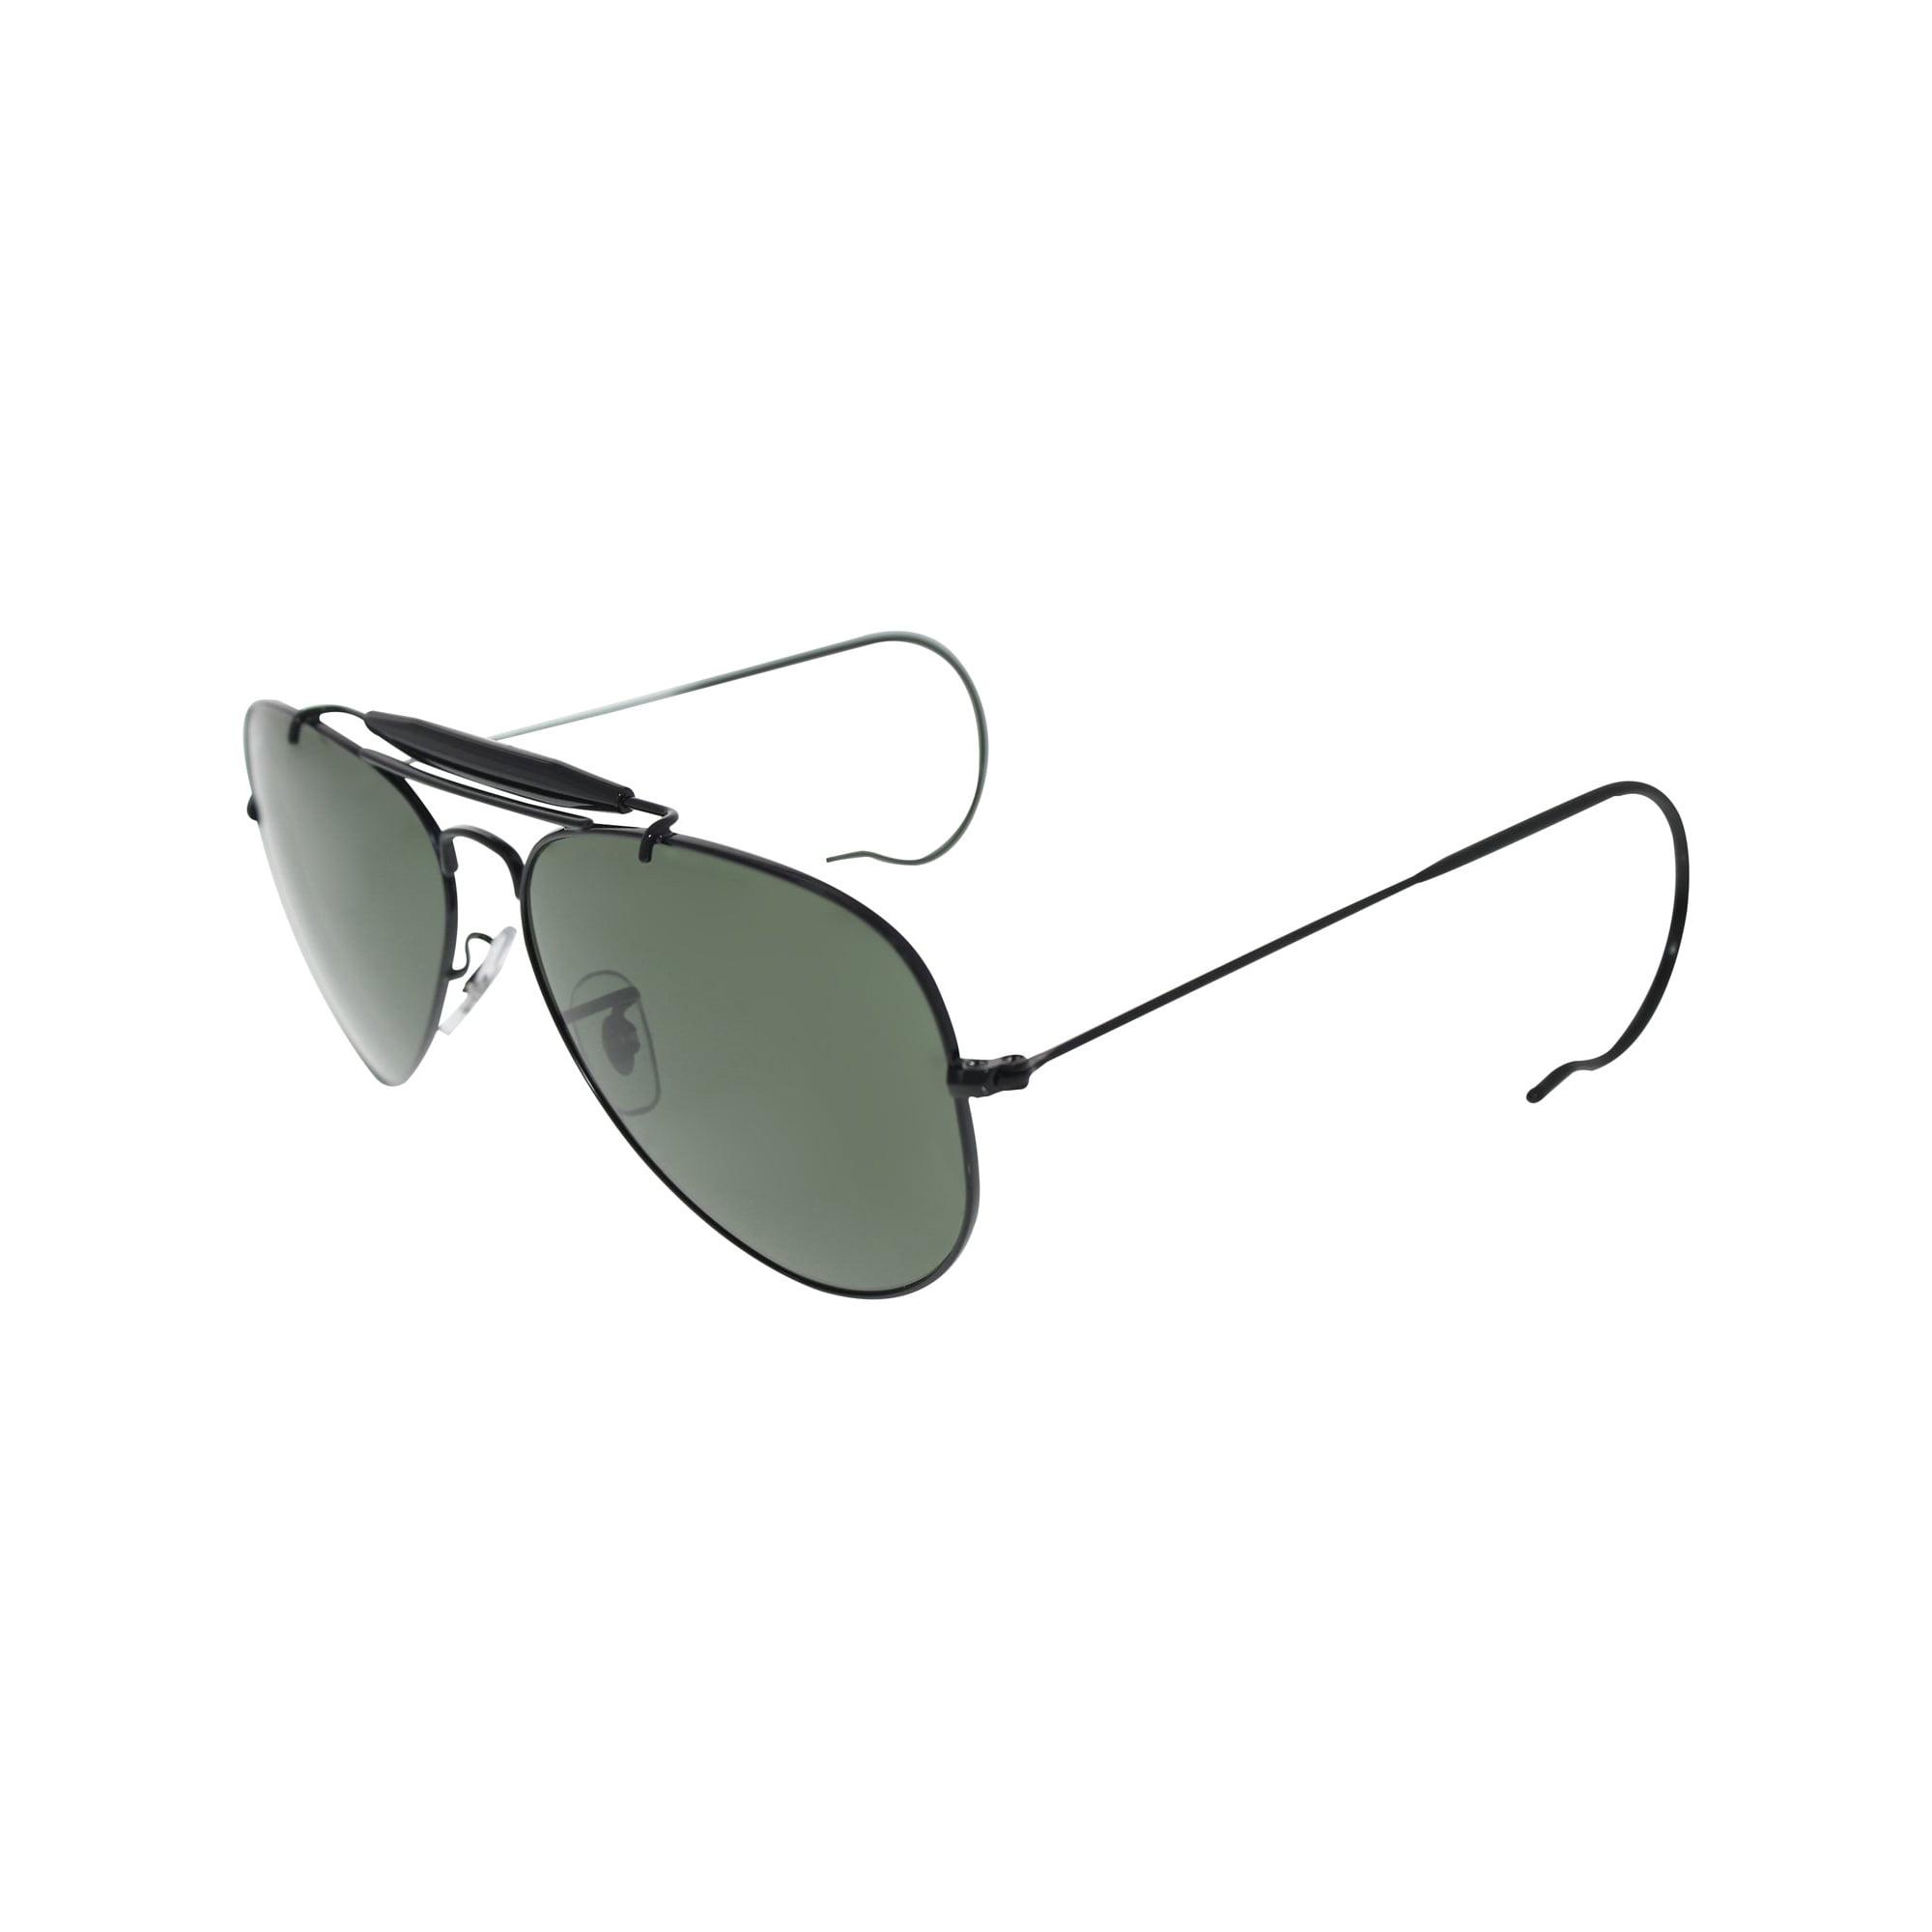 Ray Ban Men S Outdoorsman Rb3030 L9500 58 Black Aviator Sunglasses